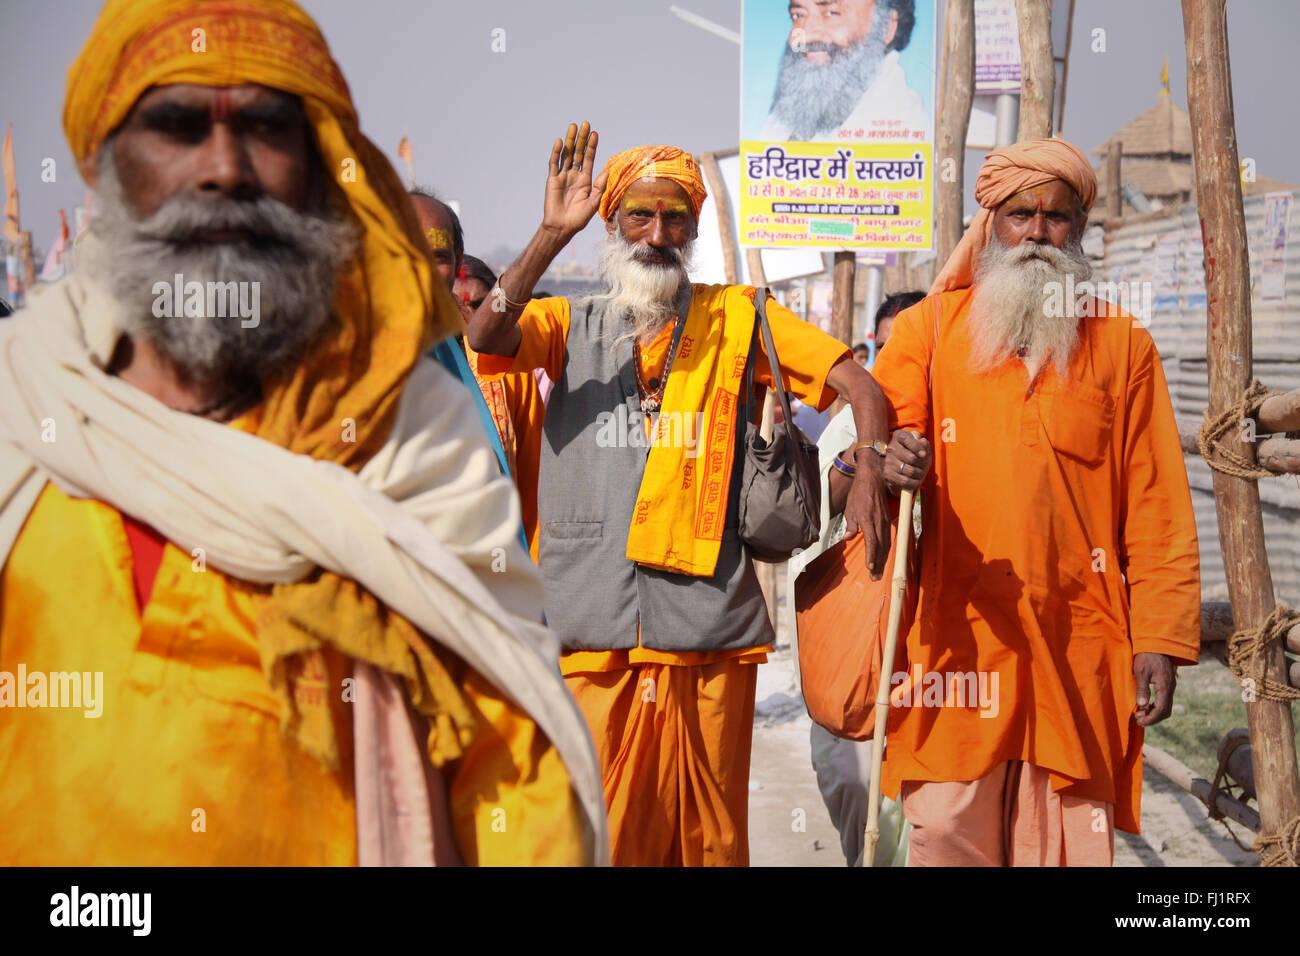 Sadhus (hindu holy men)  in Haridwar with safran colored clothes during Kumbh mela 2010 - Stock Image